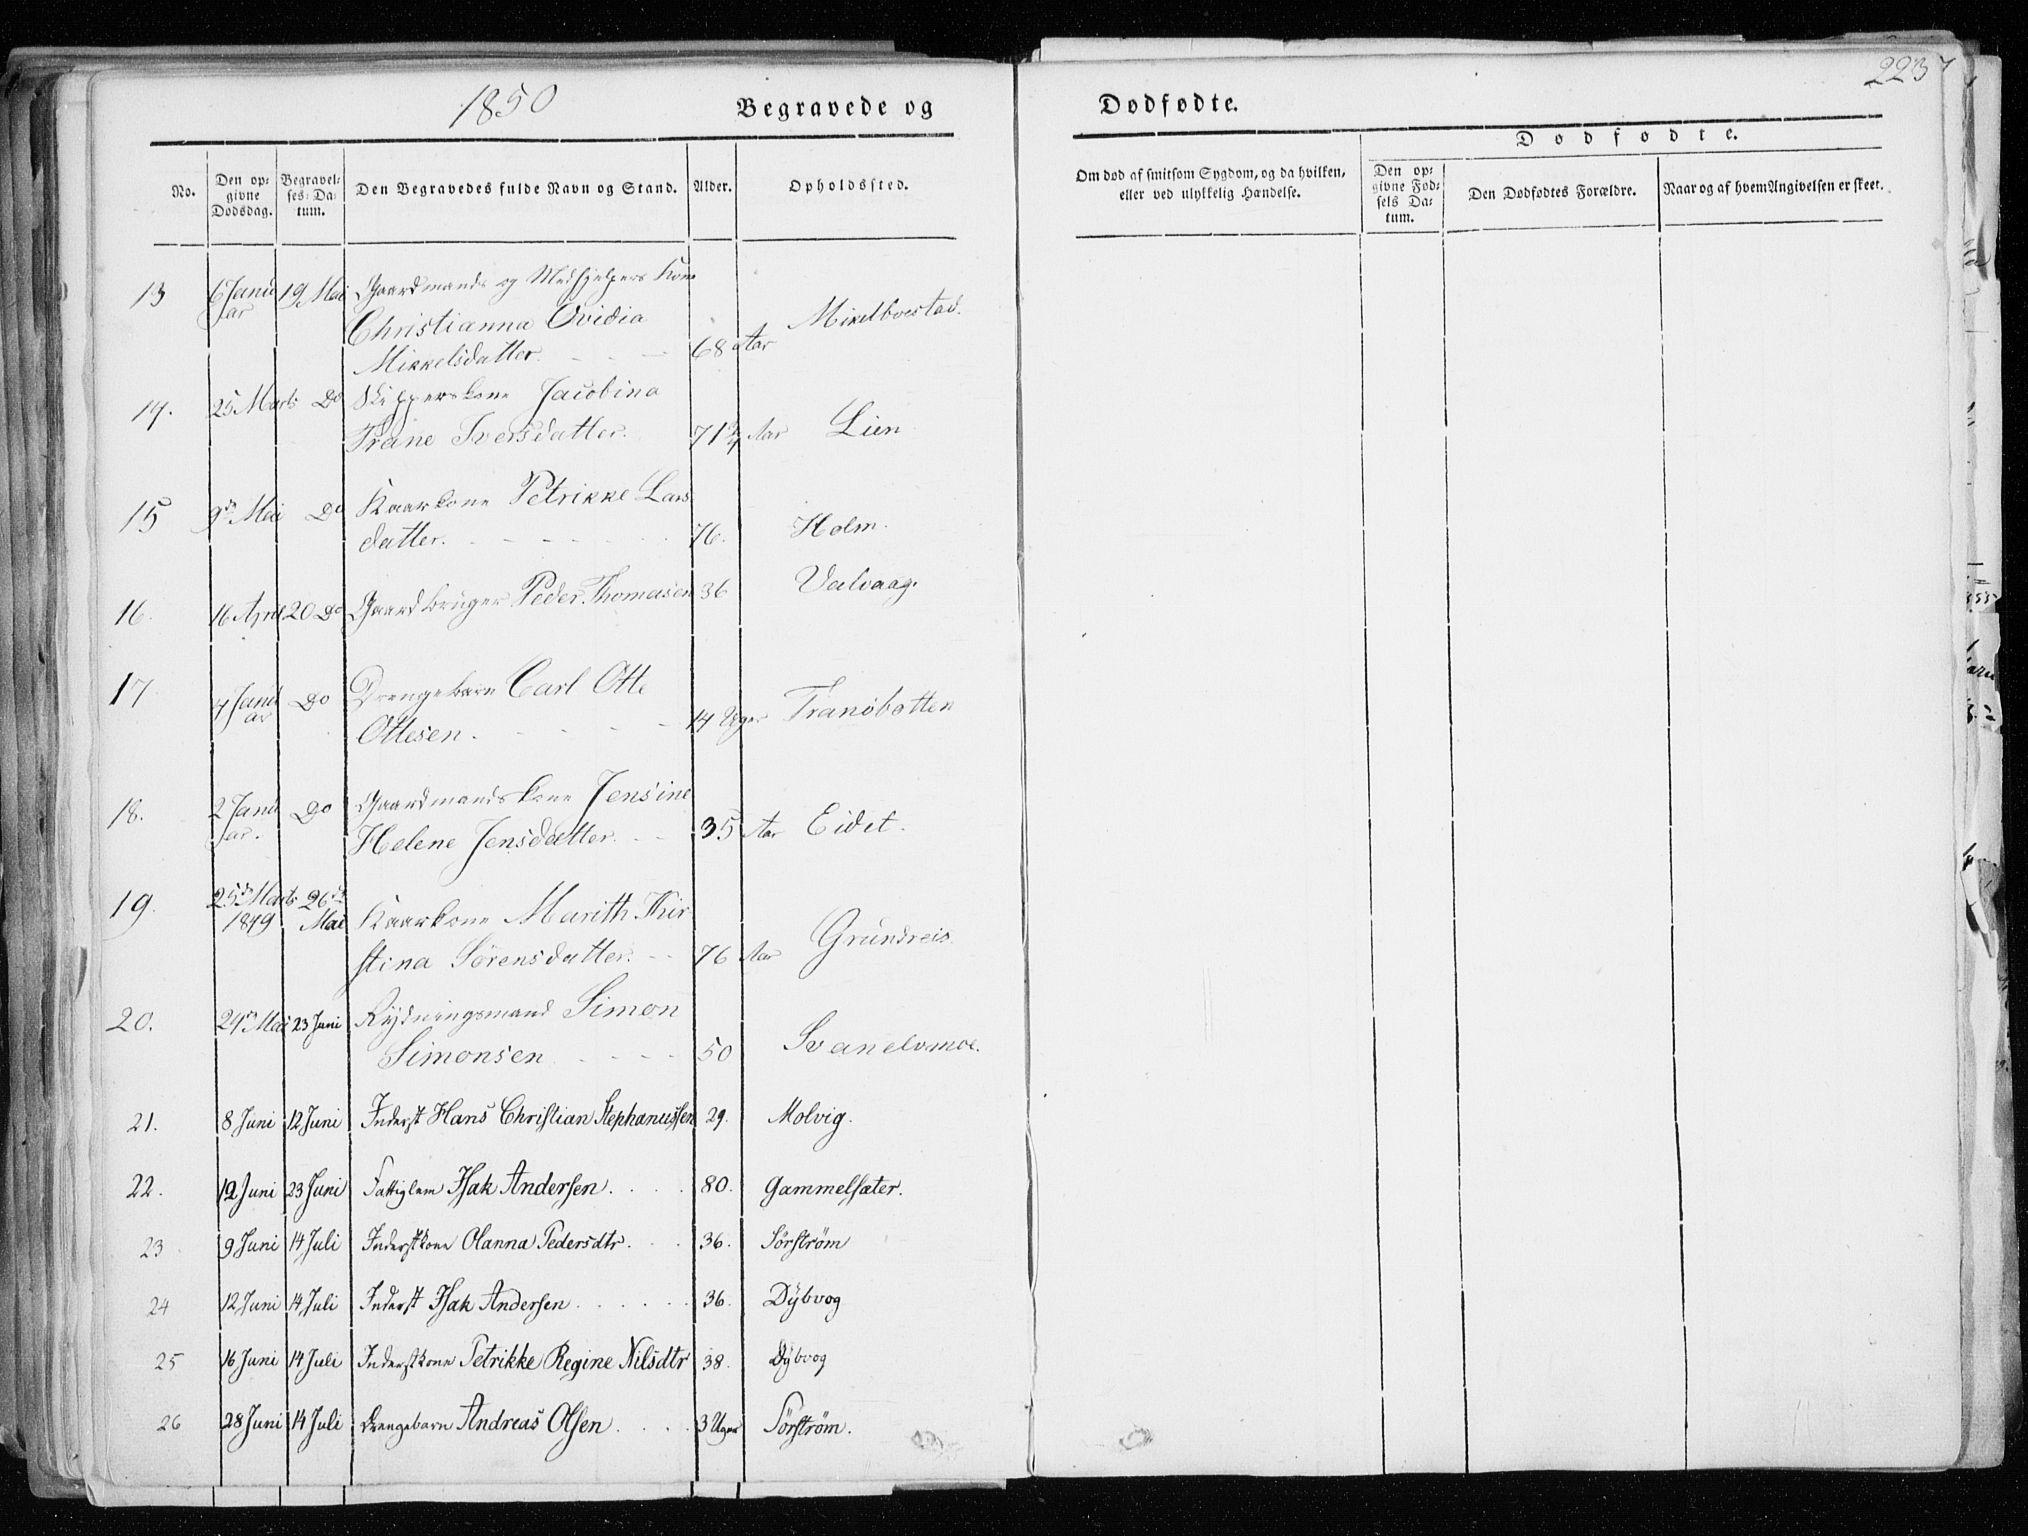 SATØ, Tranøy sokneprestkontor, I/Ia/Iaa/L0006kirke: Ministerialbok nr. 6, 1844-1855, s. 223